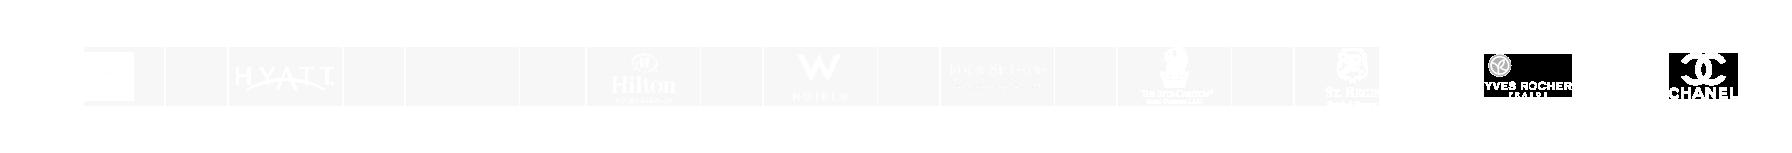 logos lw6 - LumiCell Wave 6: Аппарат по телу